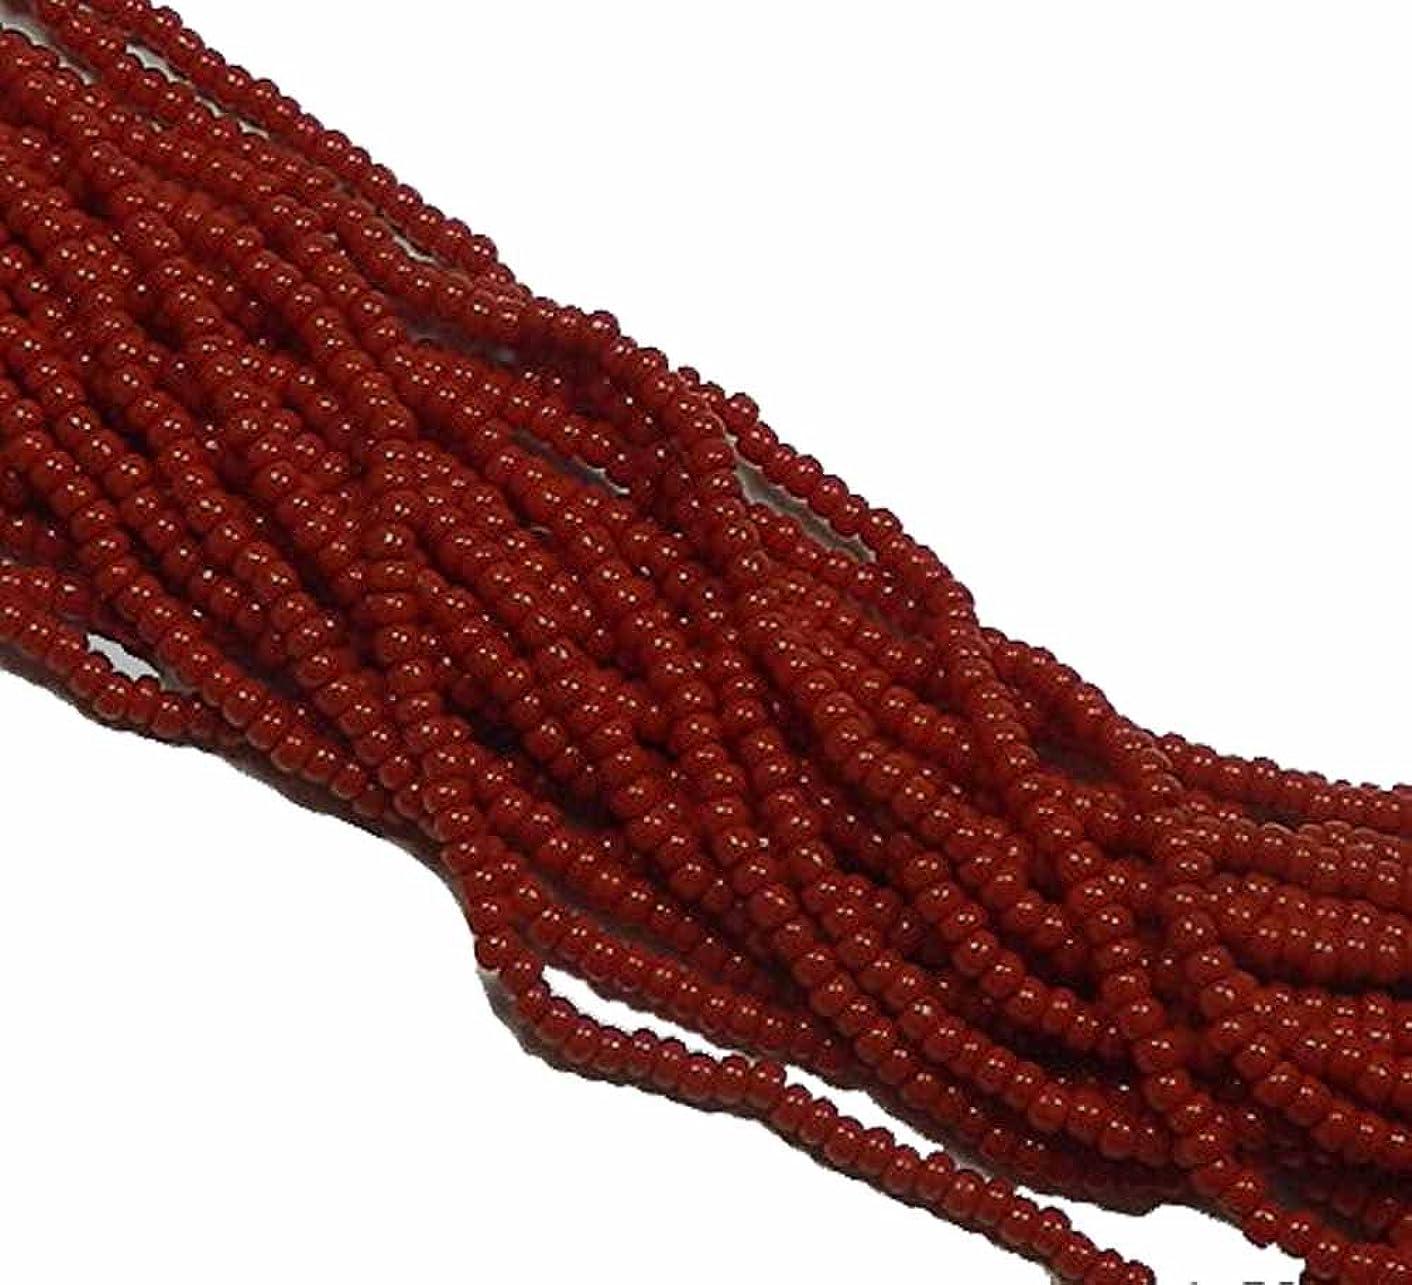 Dark Red Opaque Czech 8/0 Glass Seed Beads 1 Full 12 Strand Hank Preciosa Jablonex